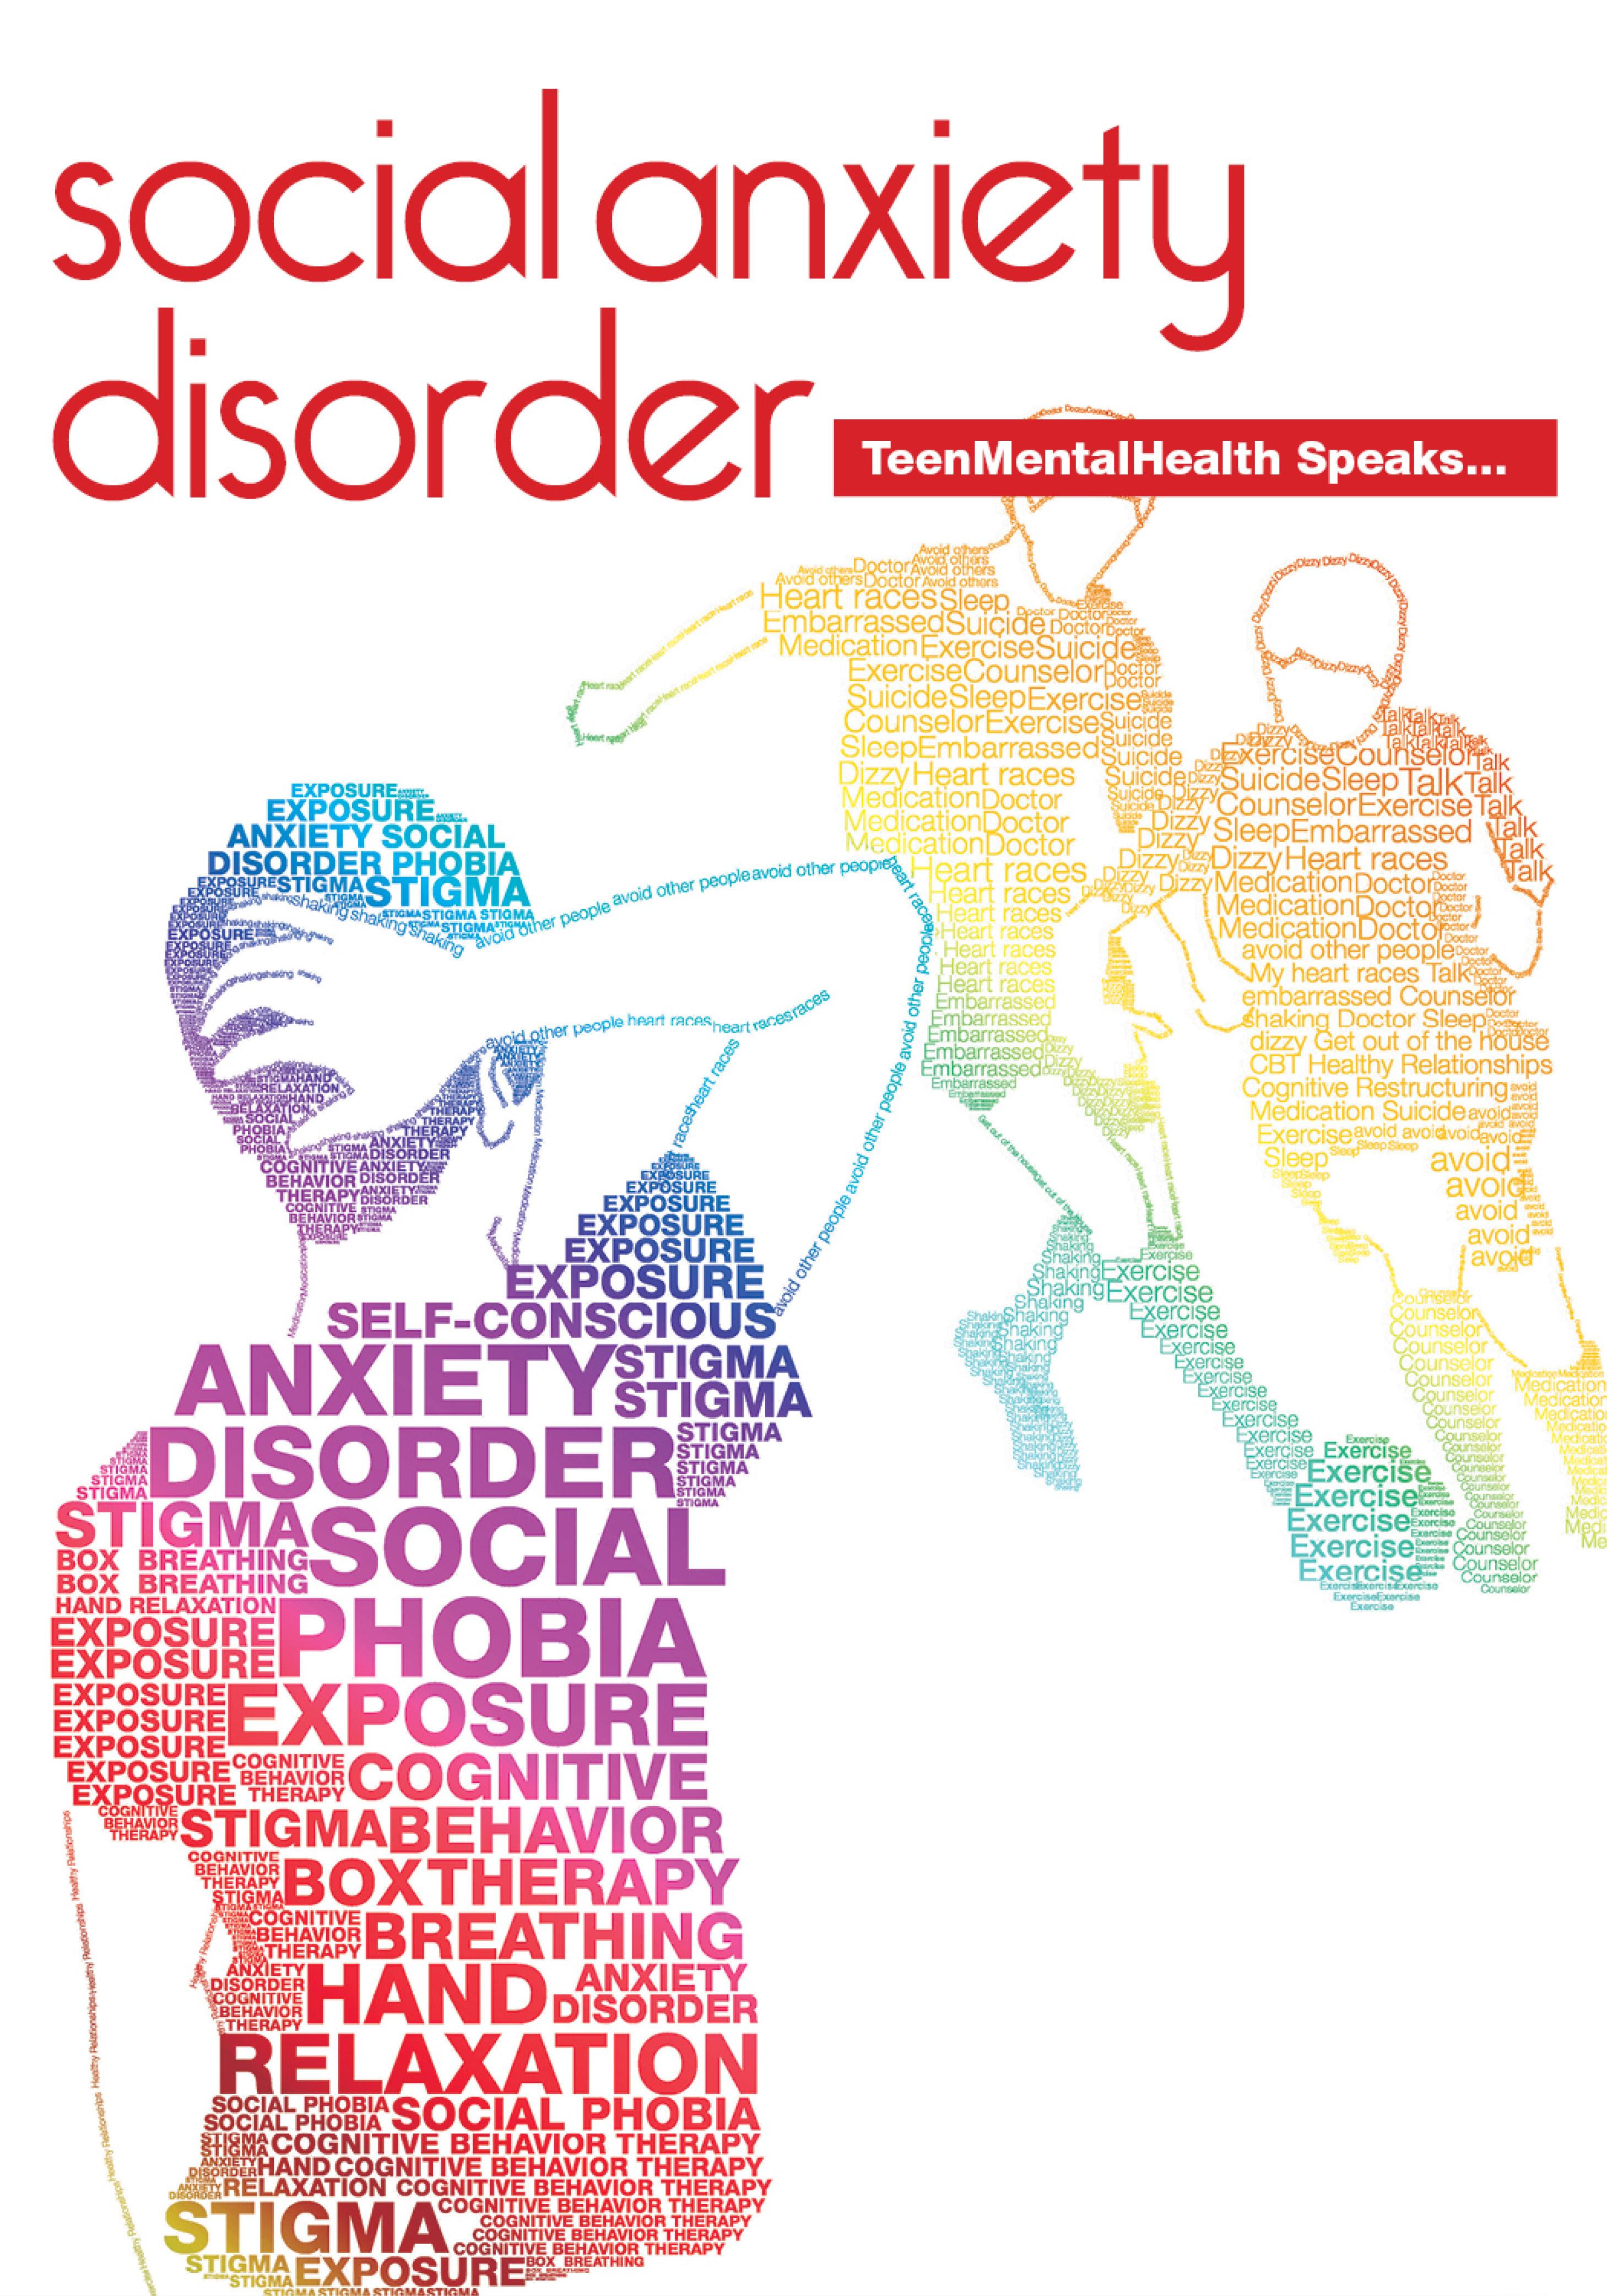 TMH Speaks... Social Anxiety Disorder - Teen Mental Health